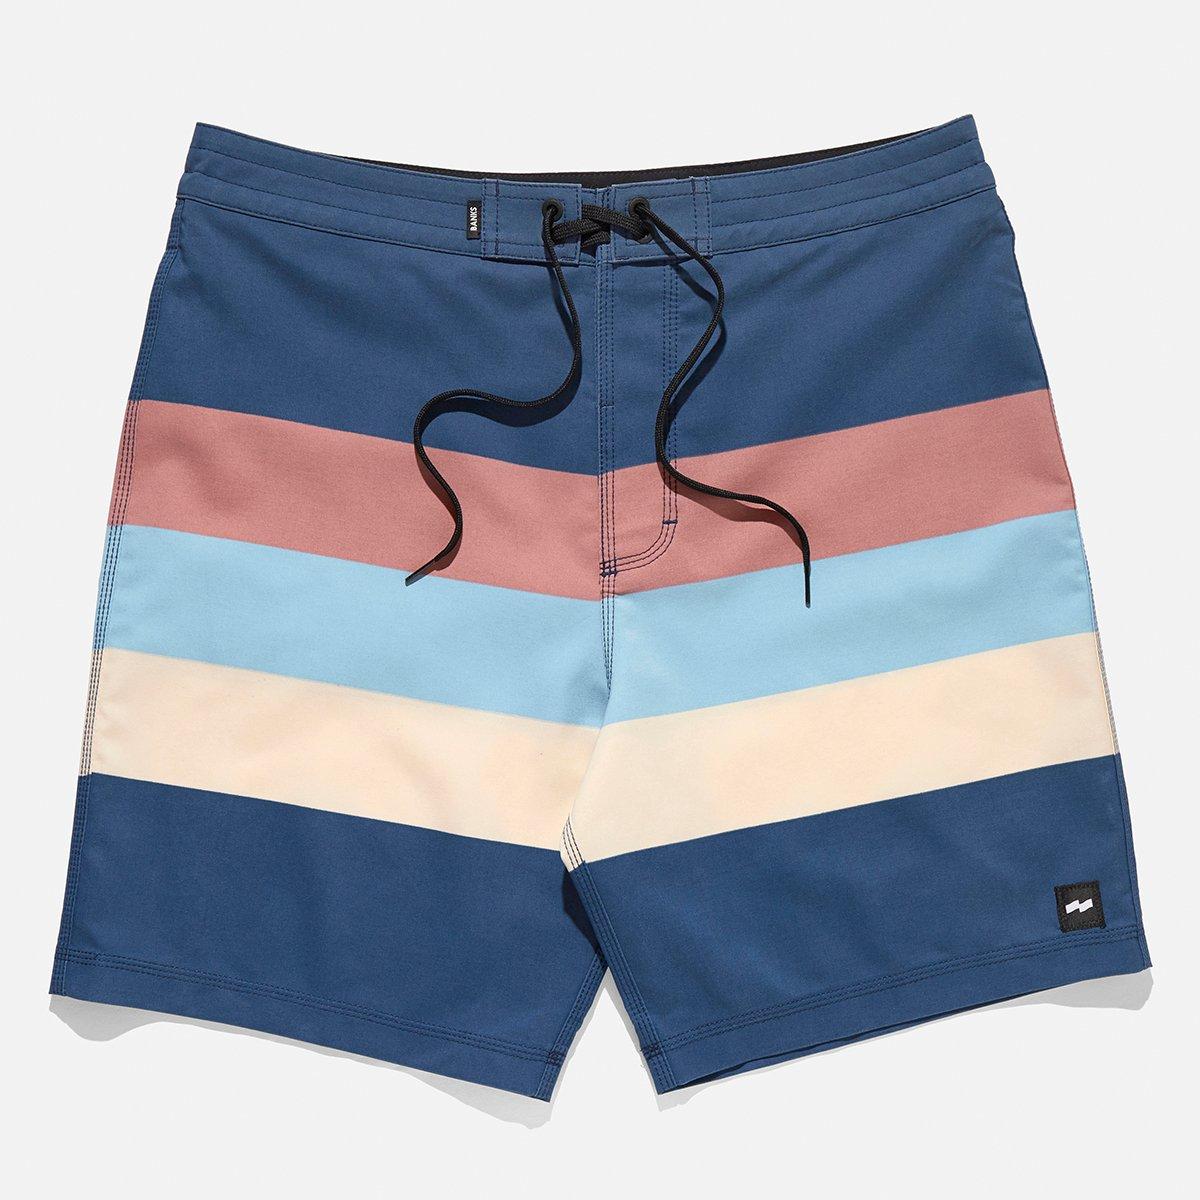 Cove Boardshort - $65